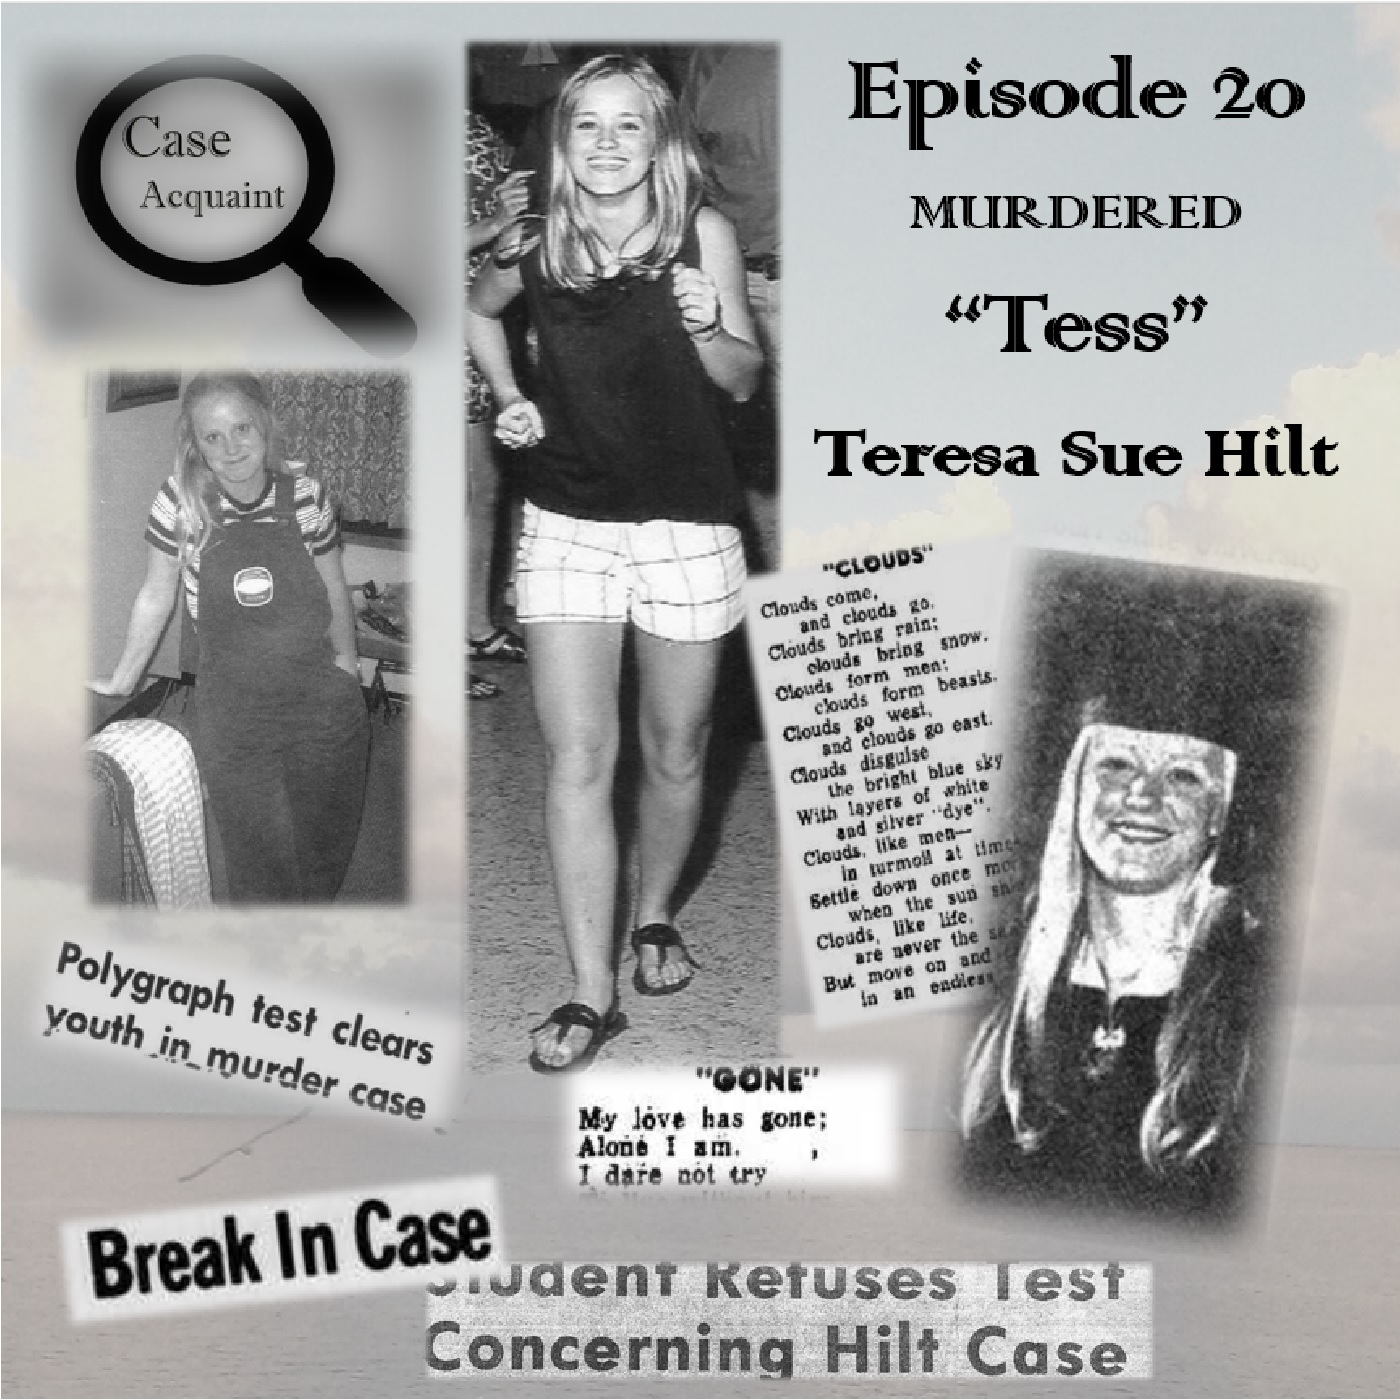 Episode 20 The Murder of Teresa Sue Hilt